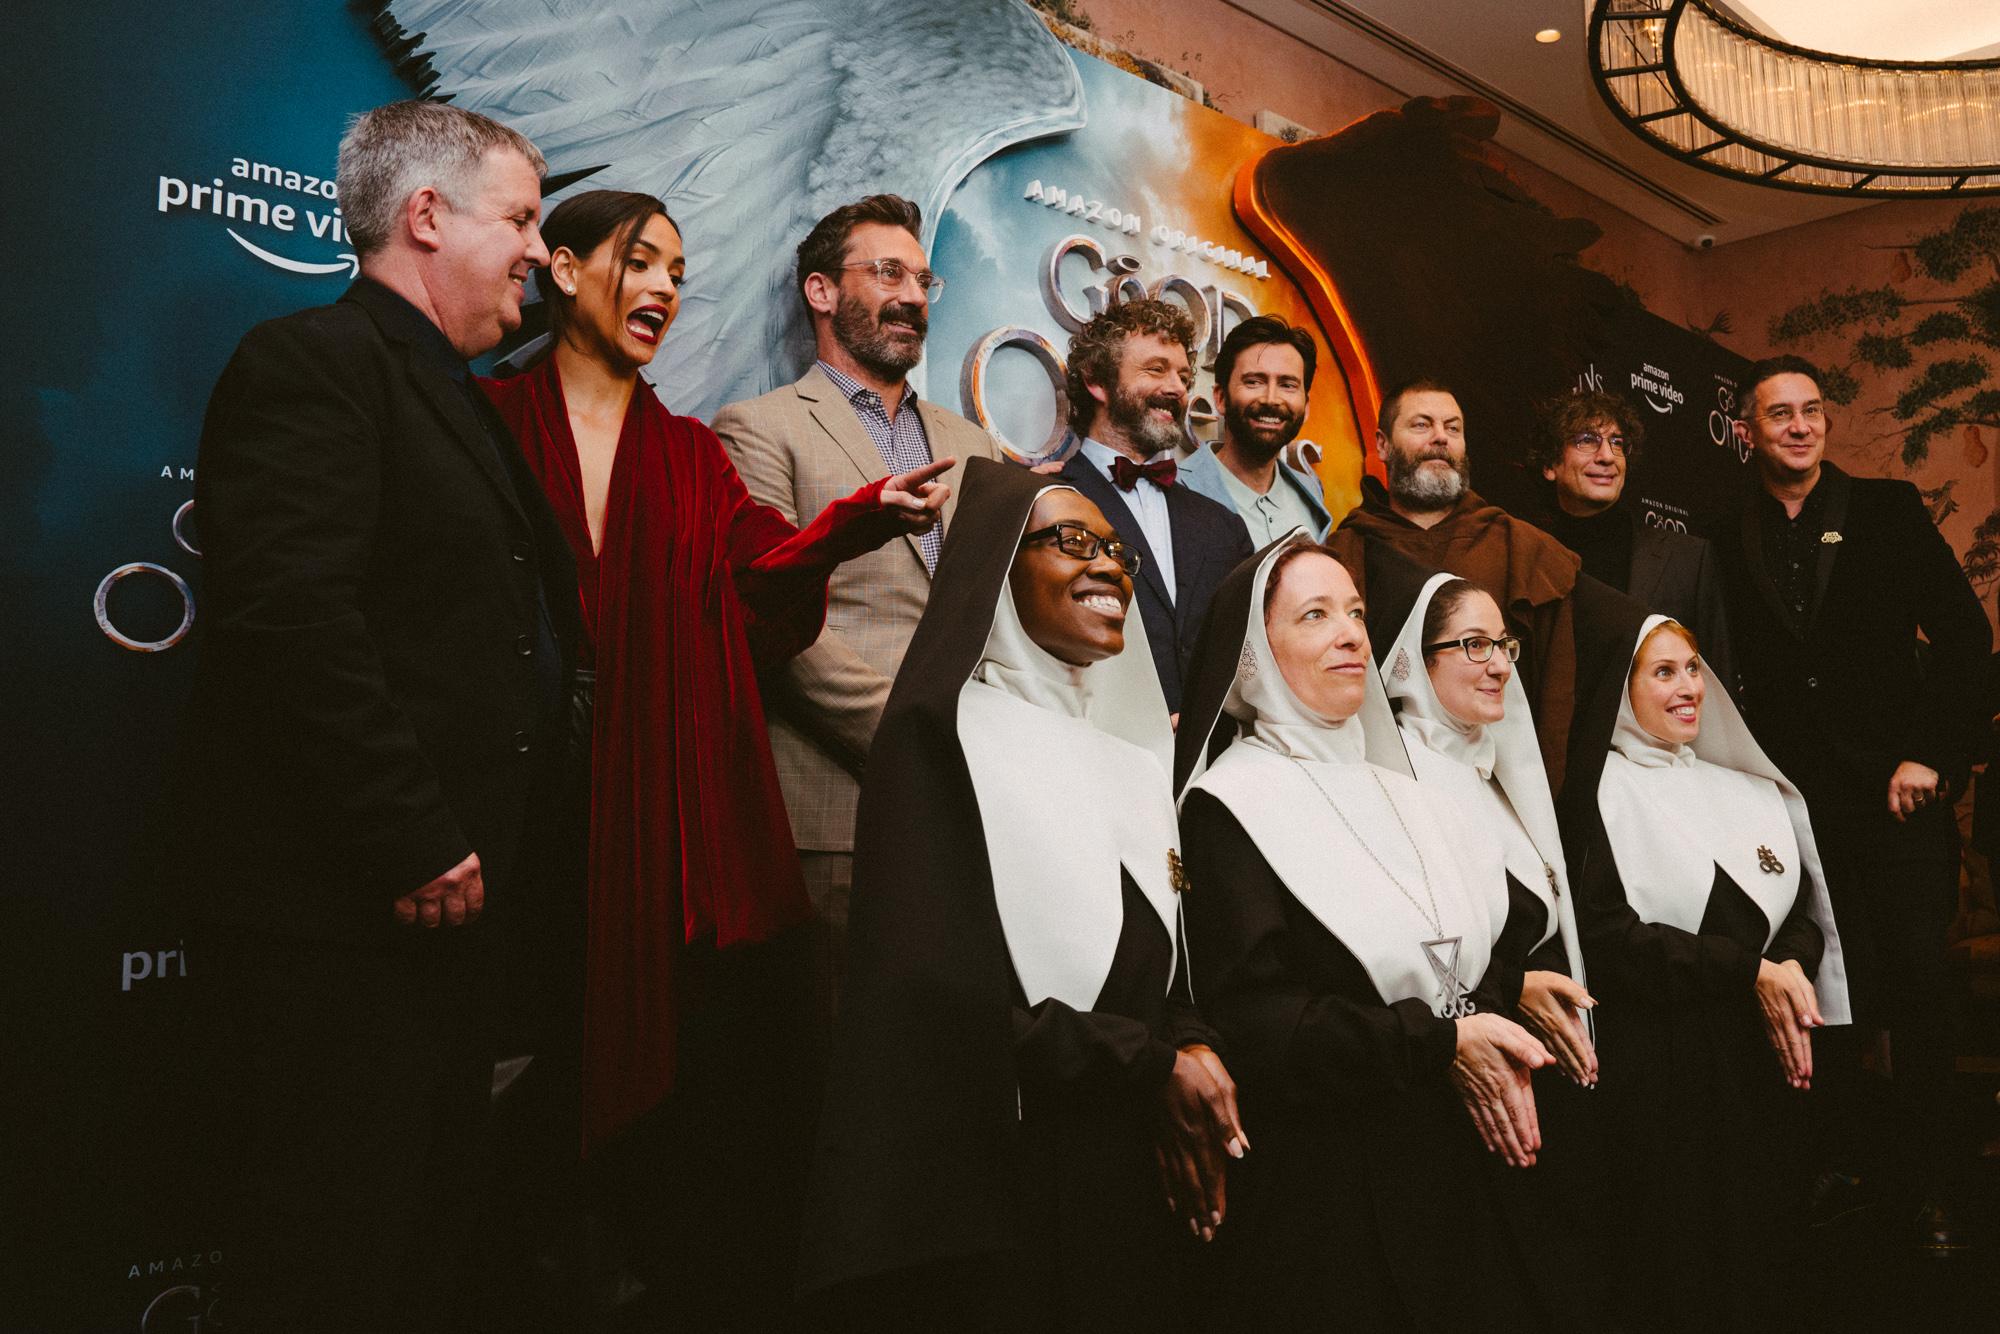 Good-Omens-chattering nuns_hal-kirkland_NYC3.jpg